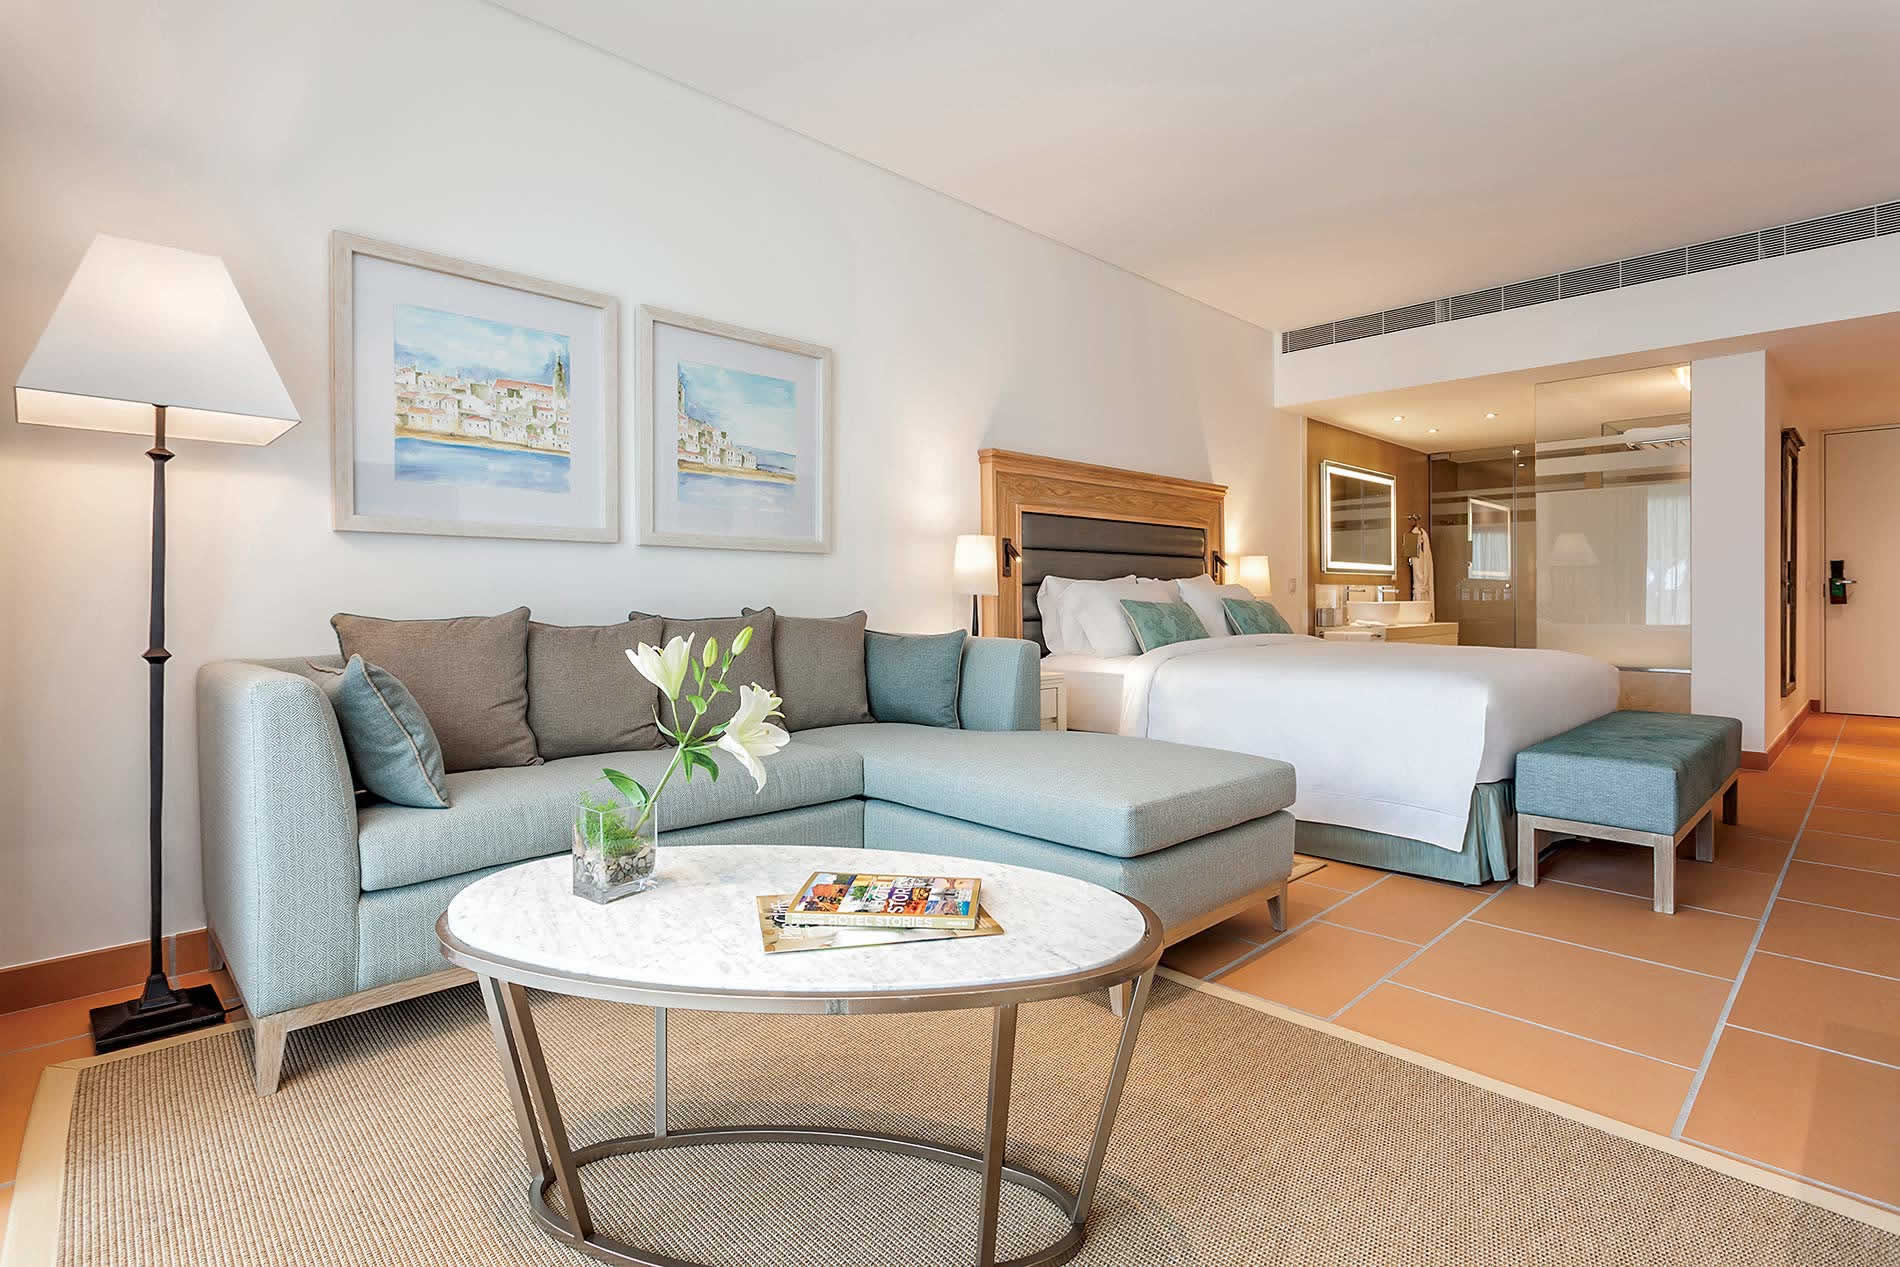 Apartment Pine Cliffs Ocean Suite I in Pine Cliffs Resort - sleeps 2 people